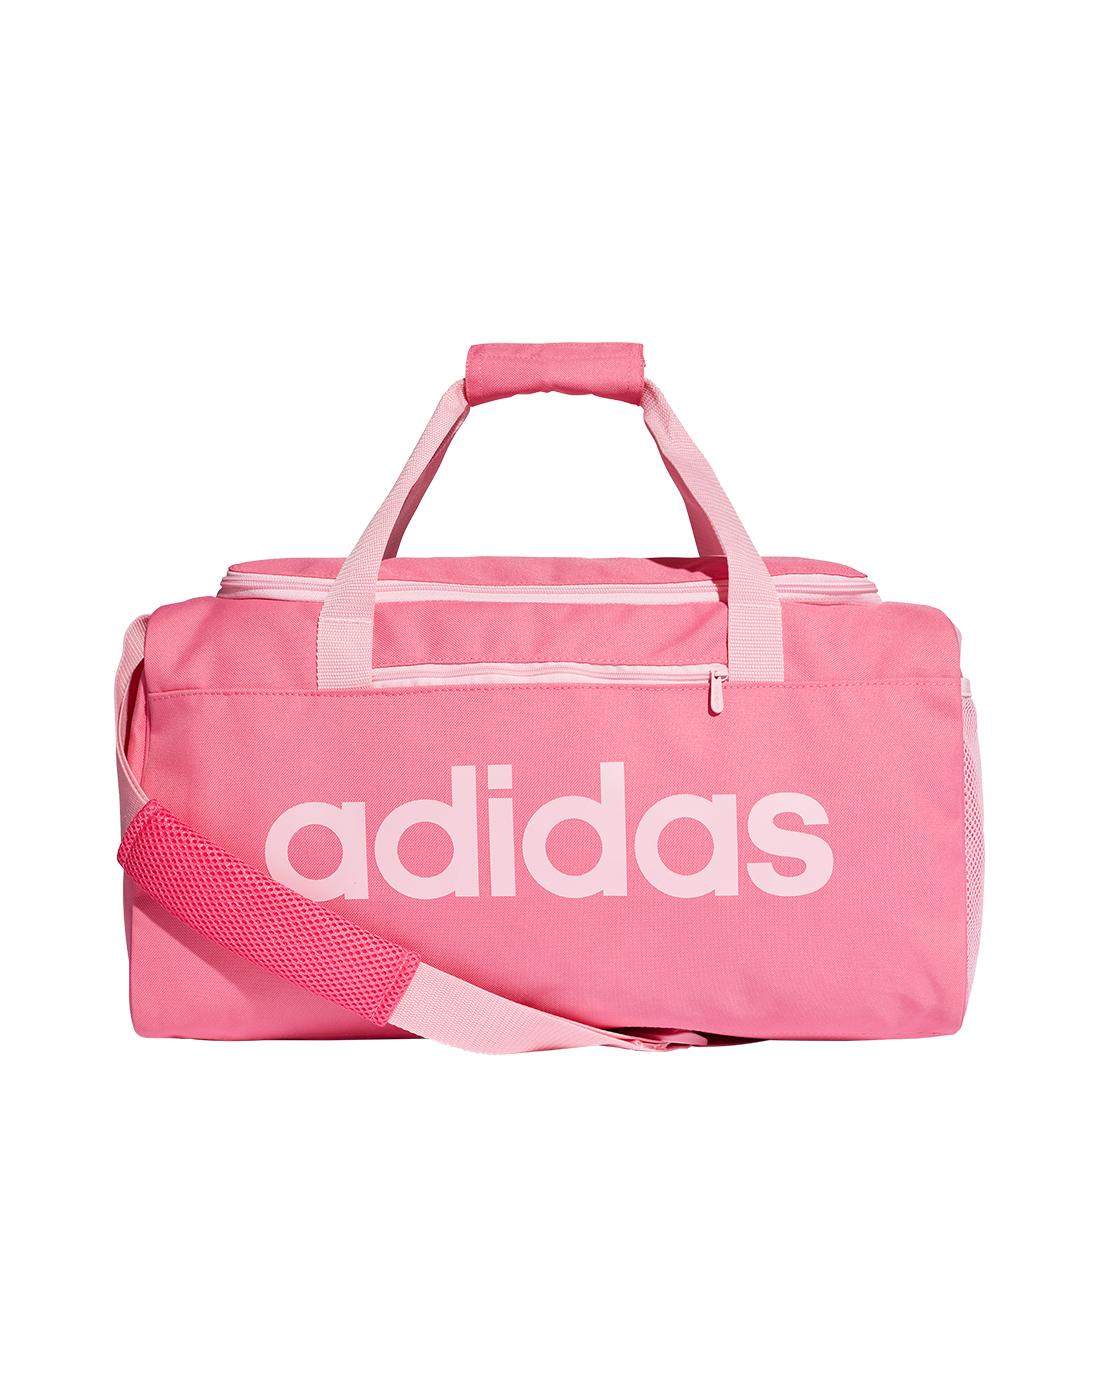 38d56dd843c Small Pink adidas Duffel Bag   Life Style Sports